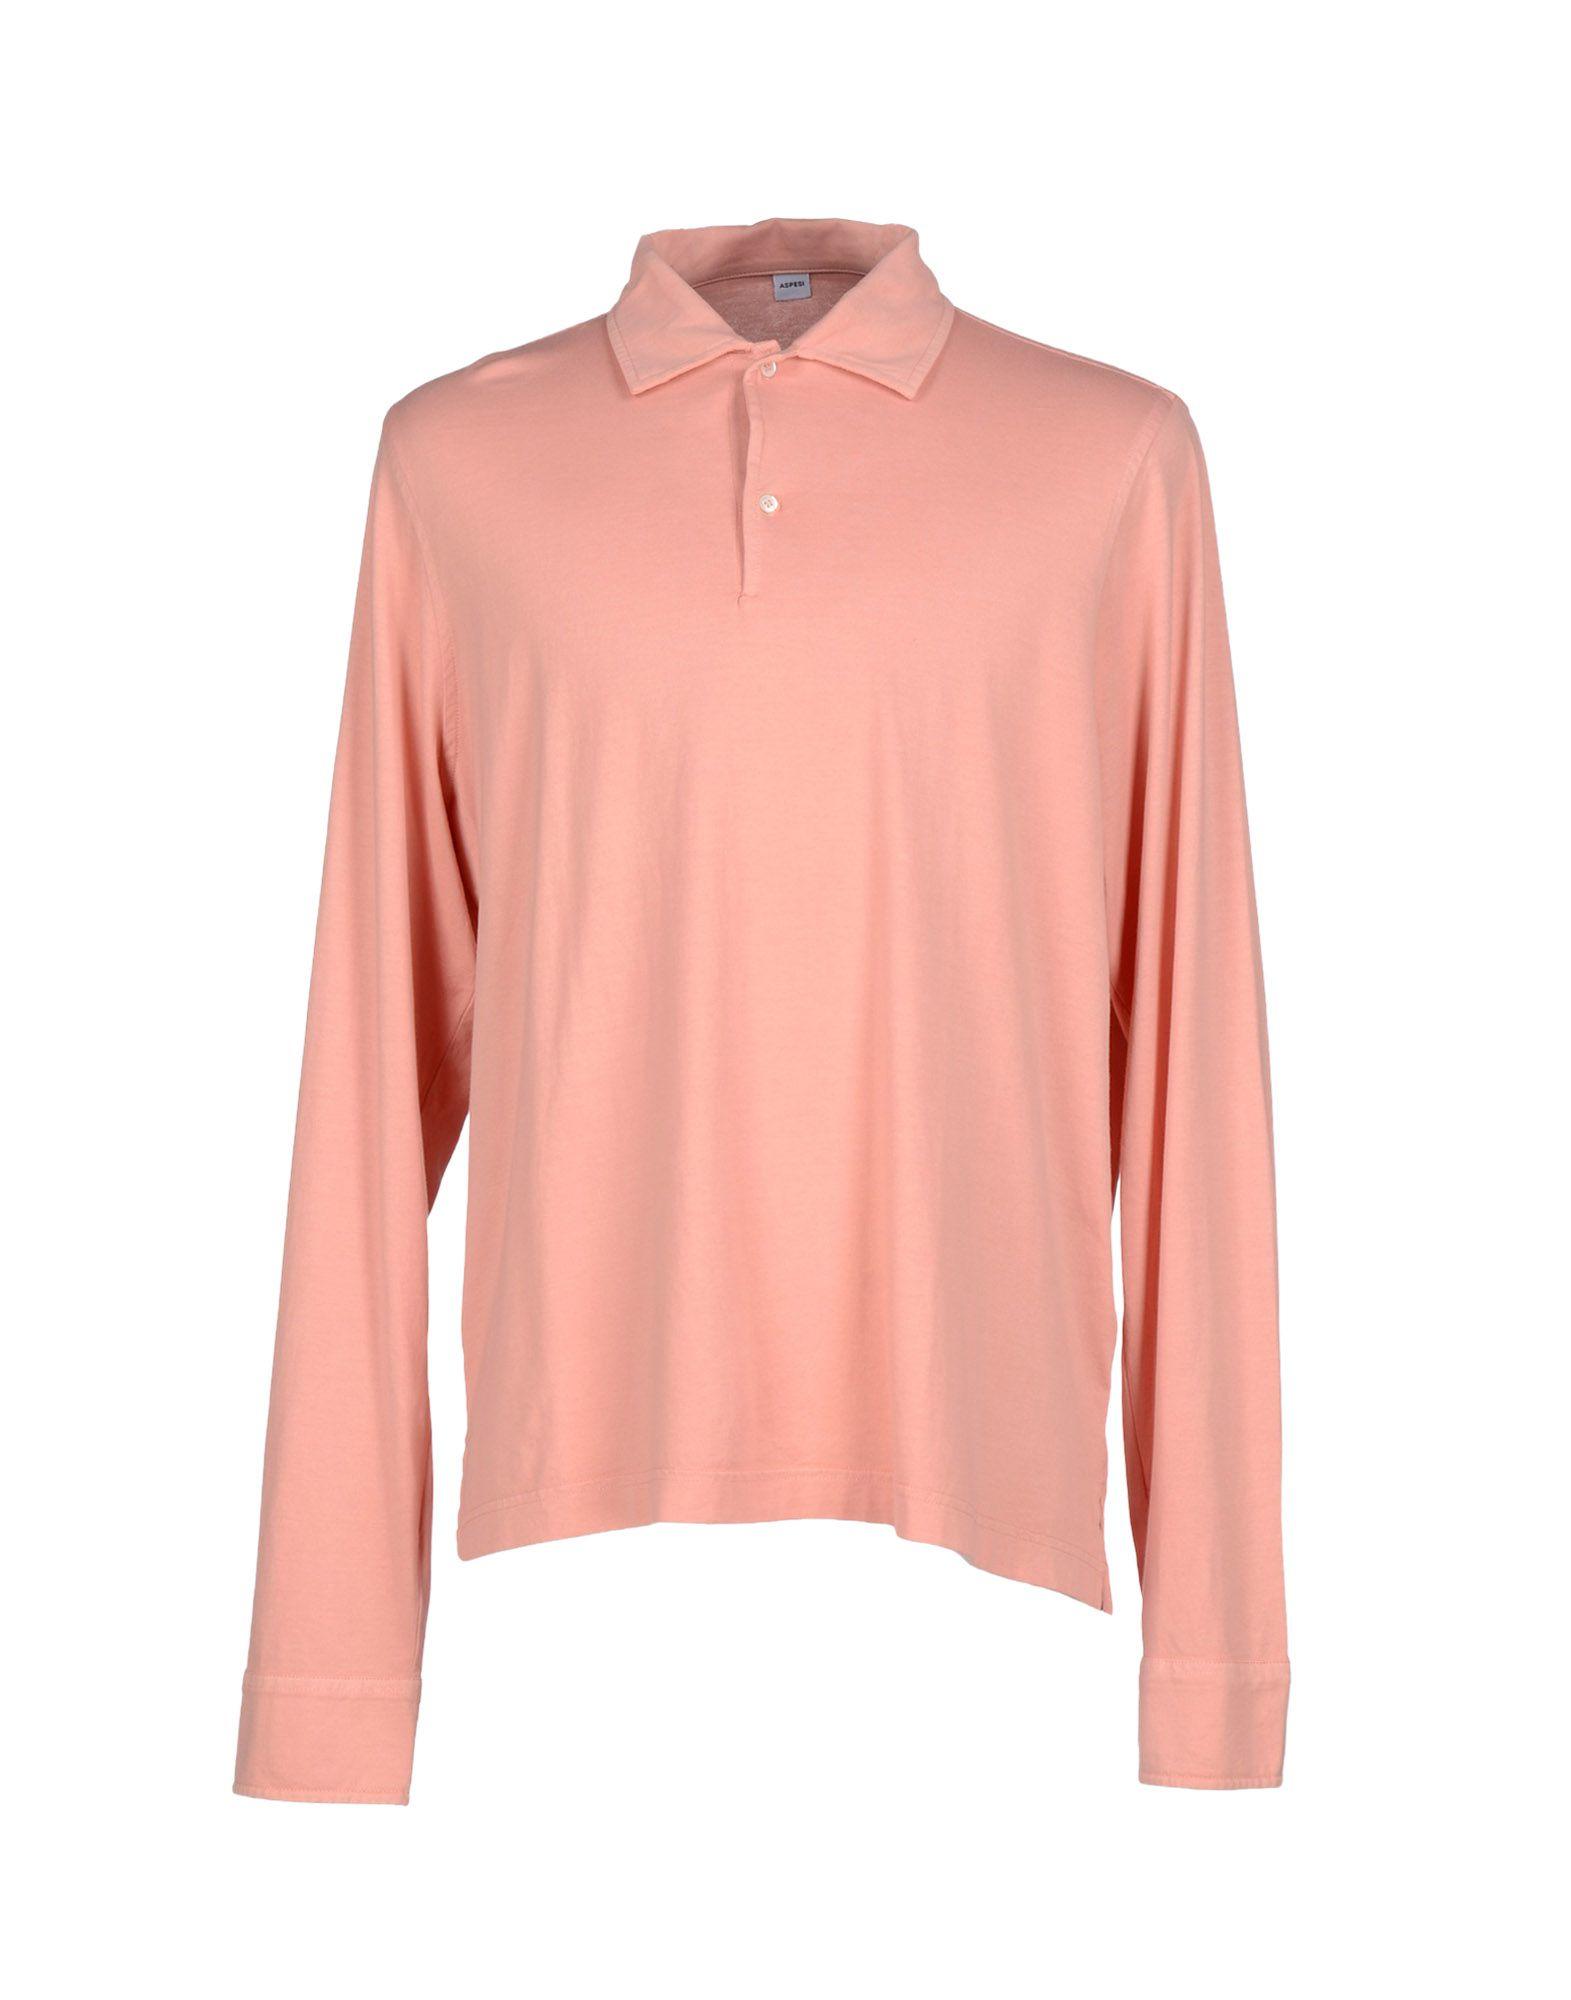 Lyst Aspesi Polo Shirt In Pink For Men